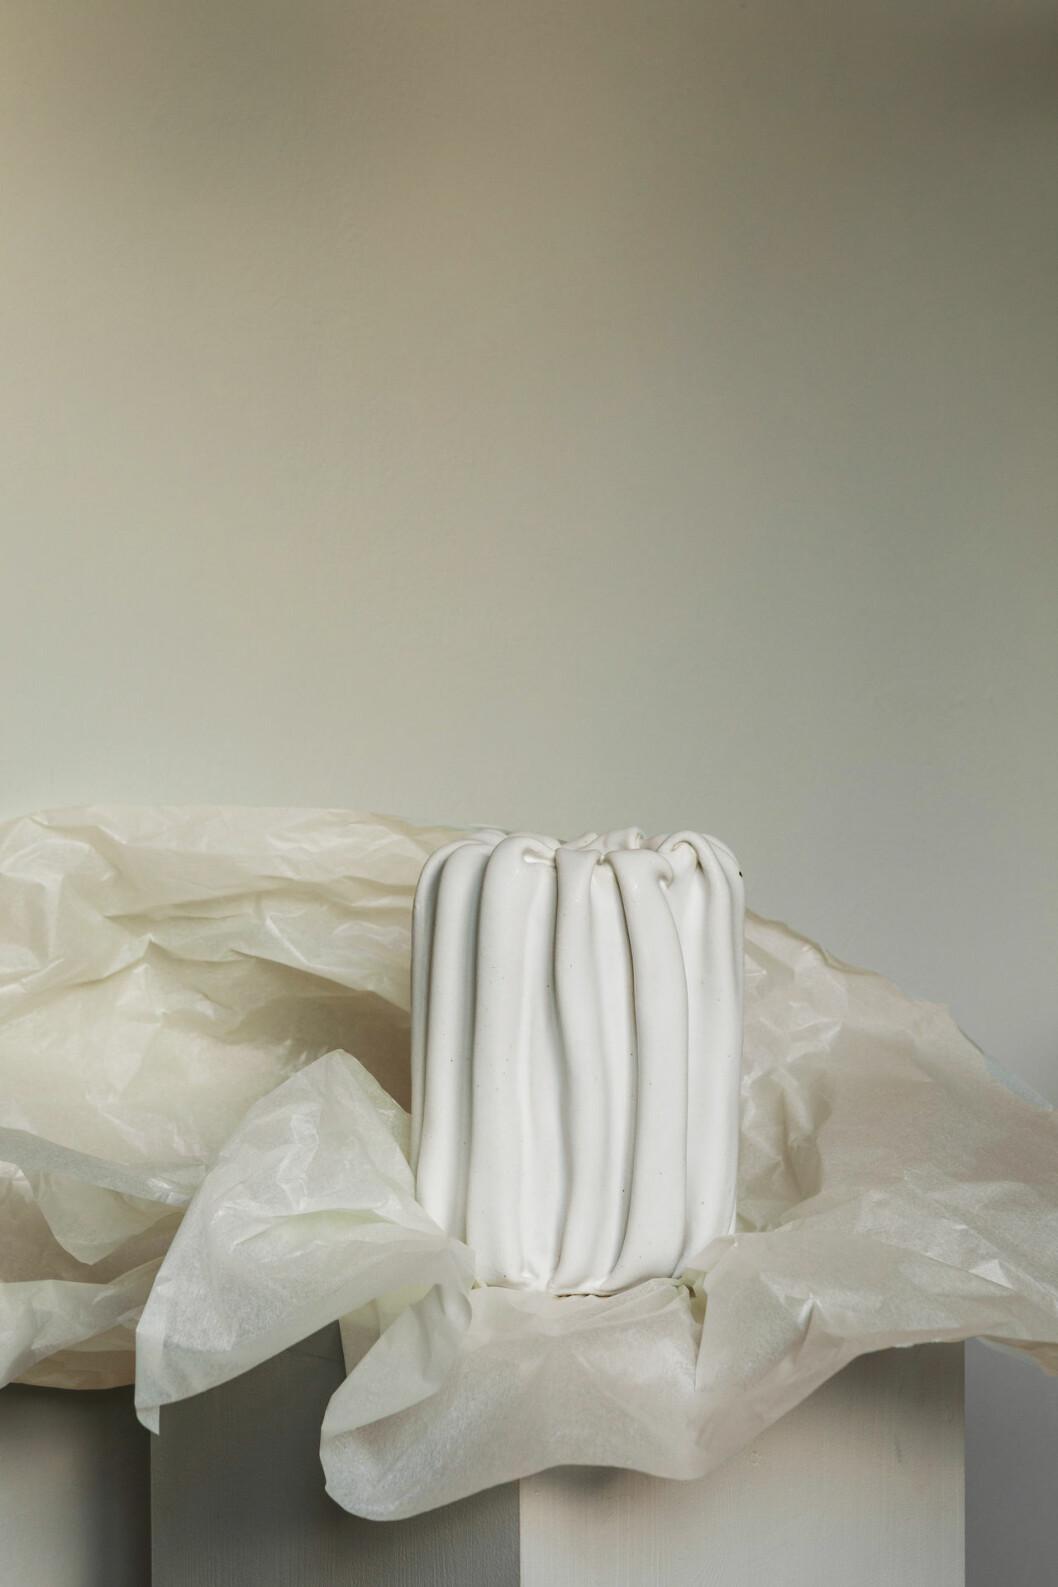 Drape Vase av Sofia Tufvasson, The Ode To